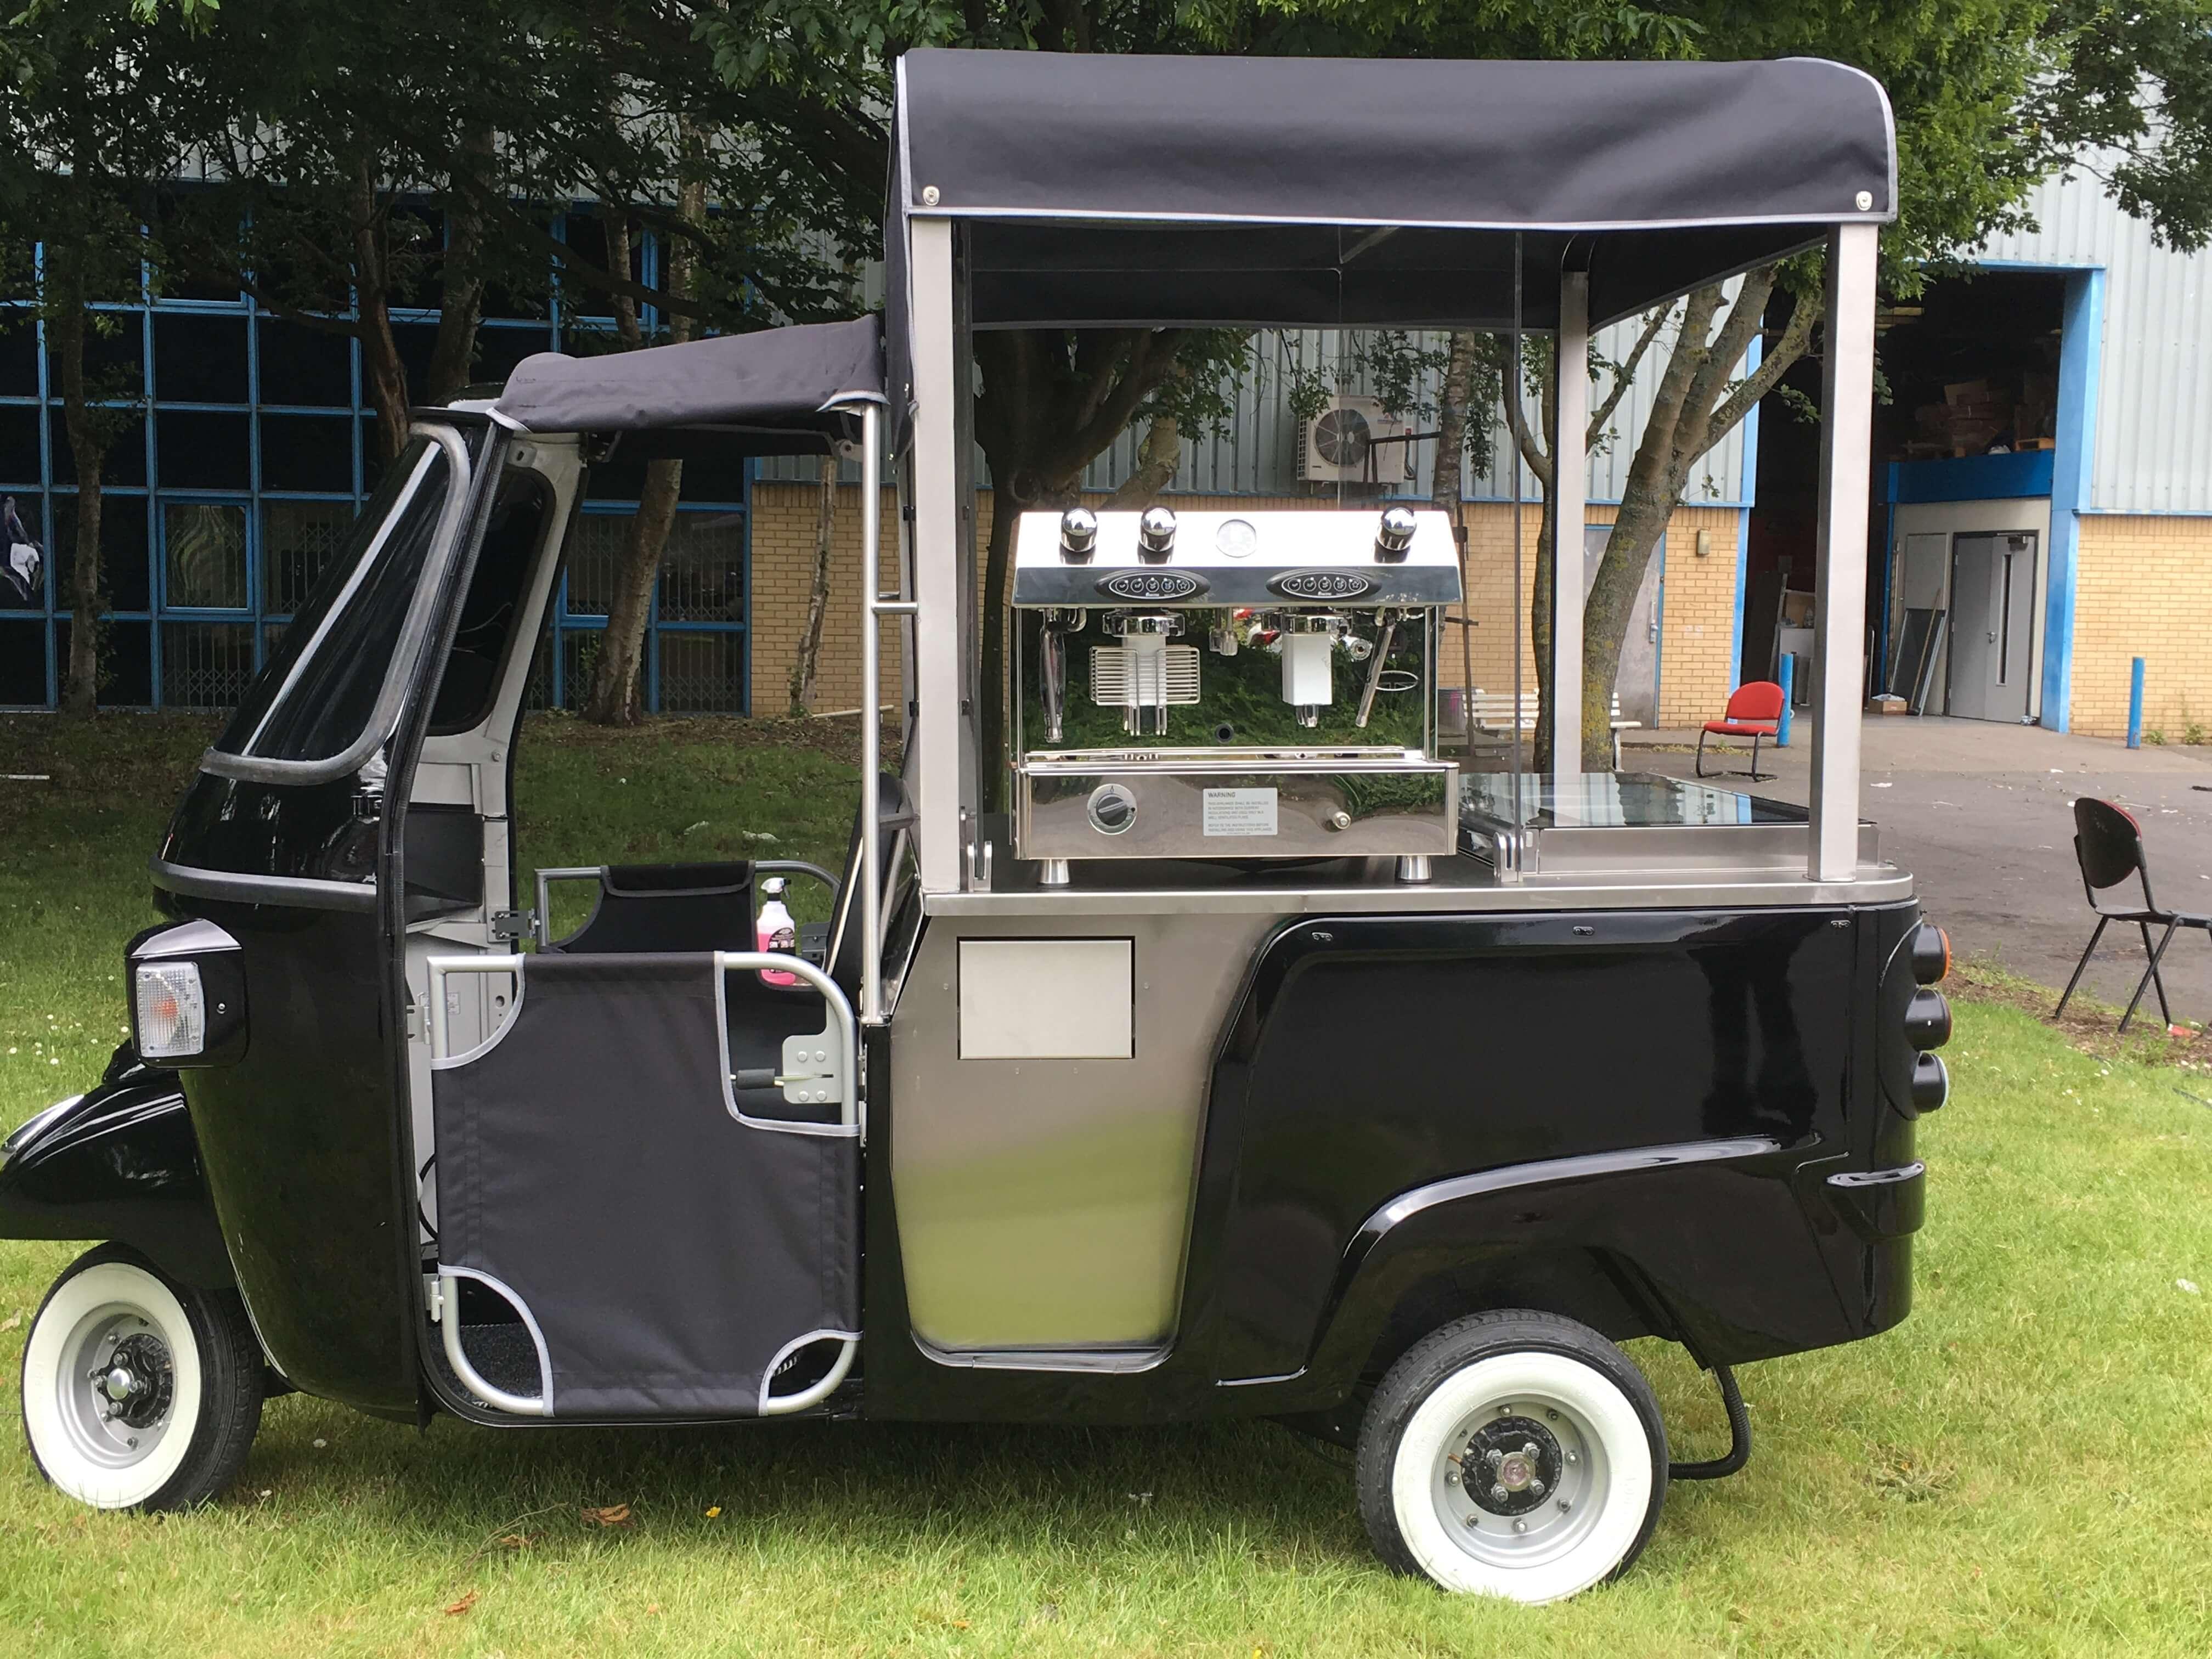 Ape Calessino Coffee Cart